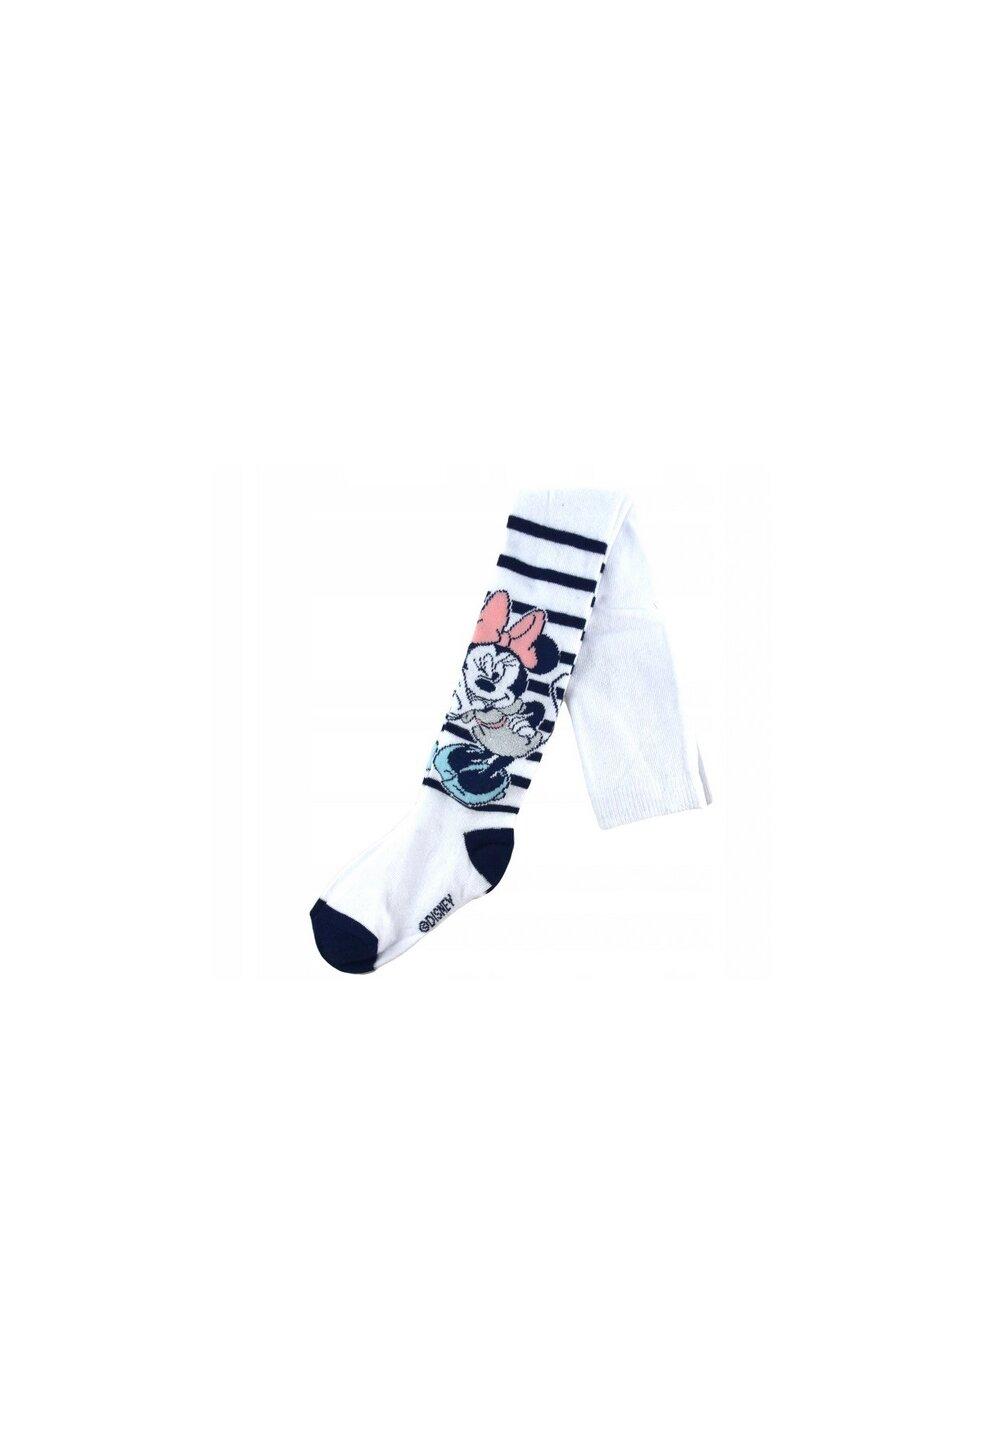 Ciorapi cu chilot bebe, Minnie Mouse, albi imagine